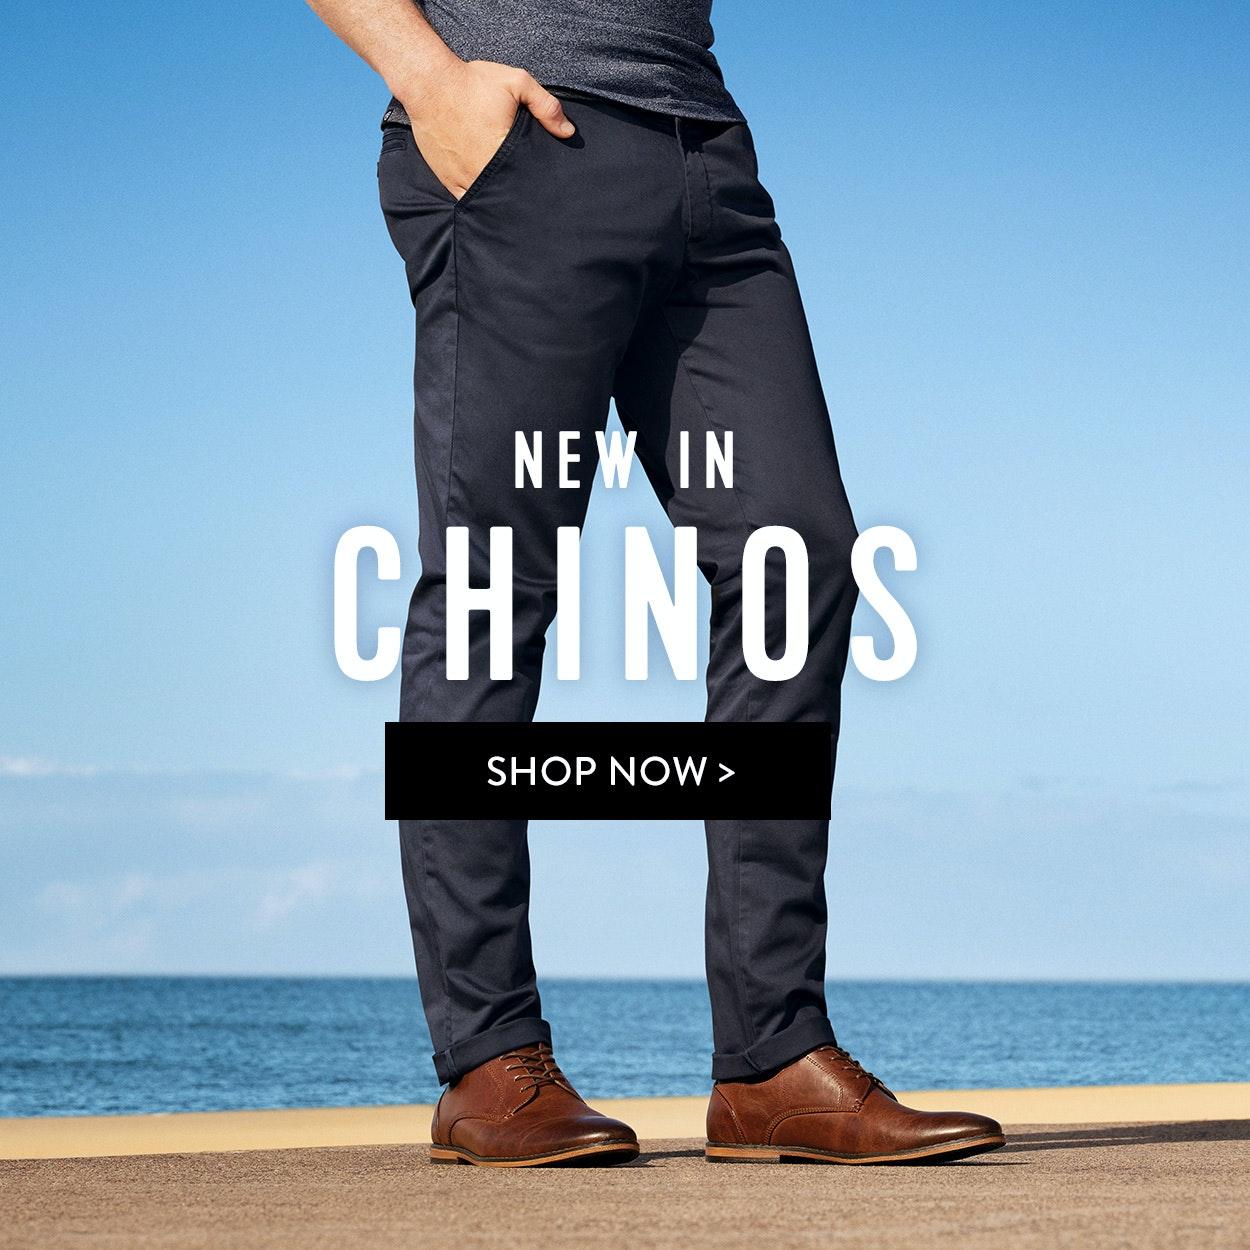 Chinos & Denim mens pants: 2 for $100